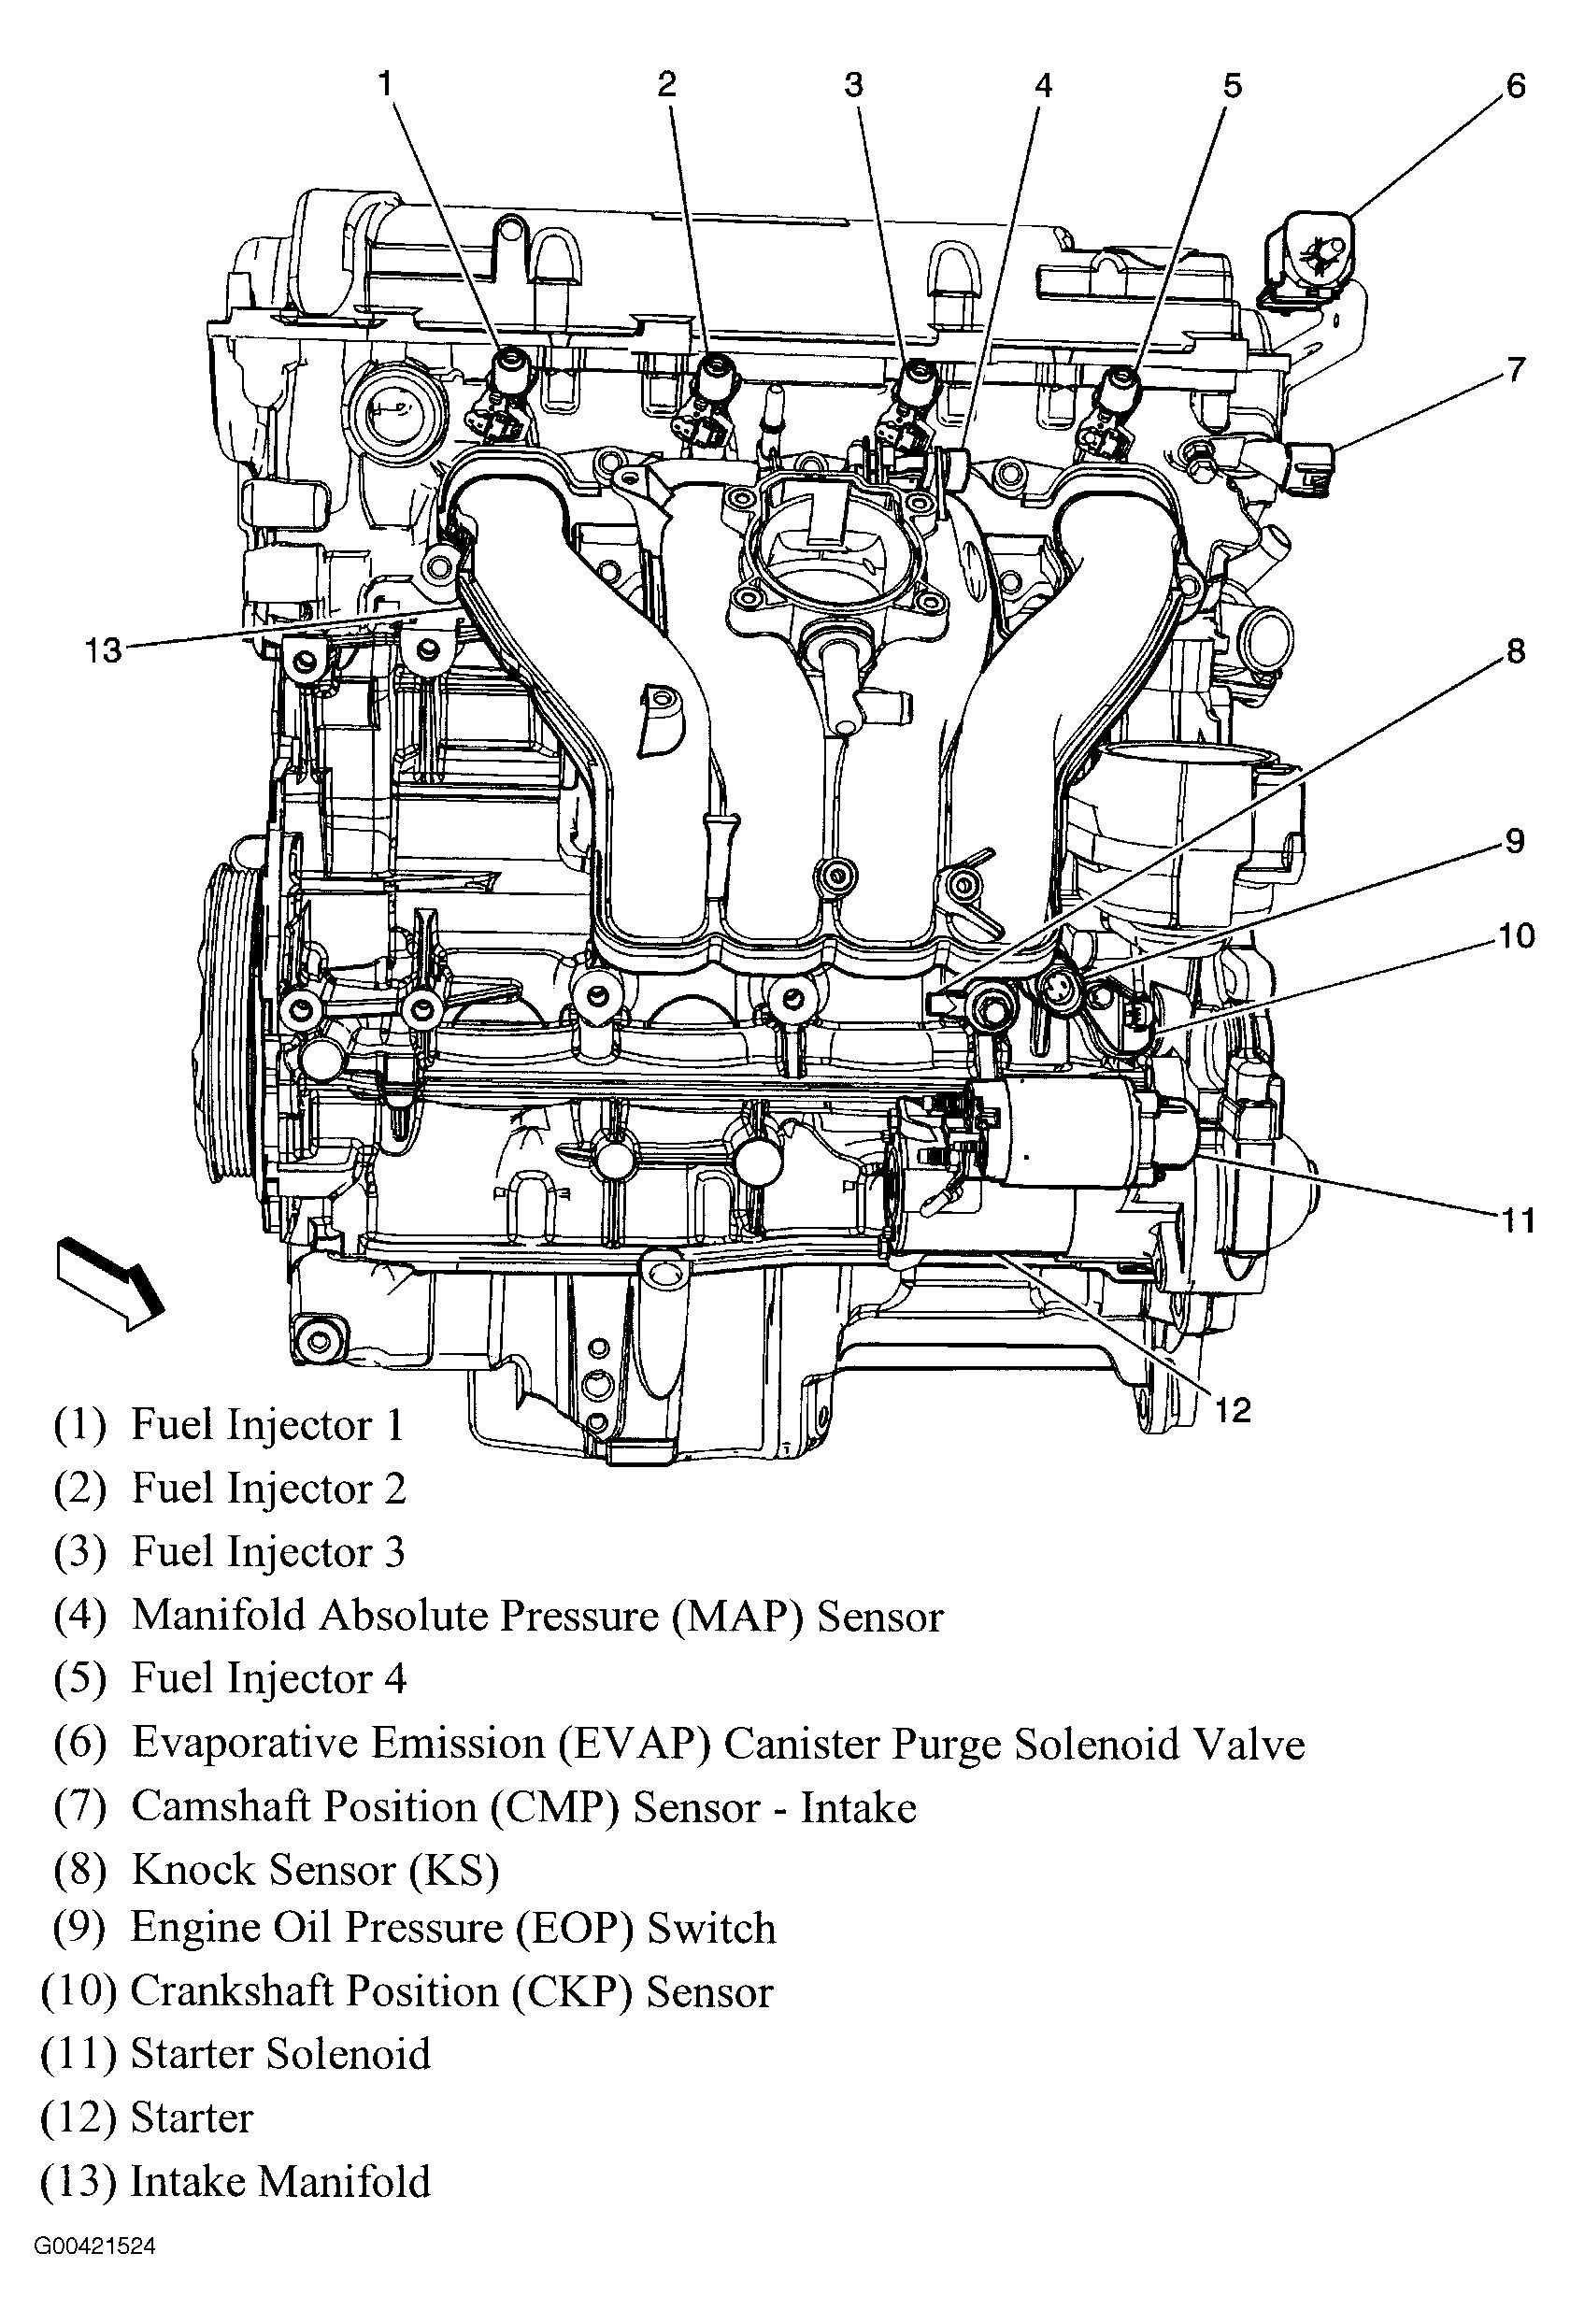 VS_1289] Belt Diagram 1994 Chevy Cavalier Engine Diagram Chevy Cavalier  Engine Wiring DiagramMecad Trons Mohammedshrine Librar Wiring 101